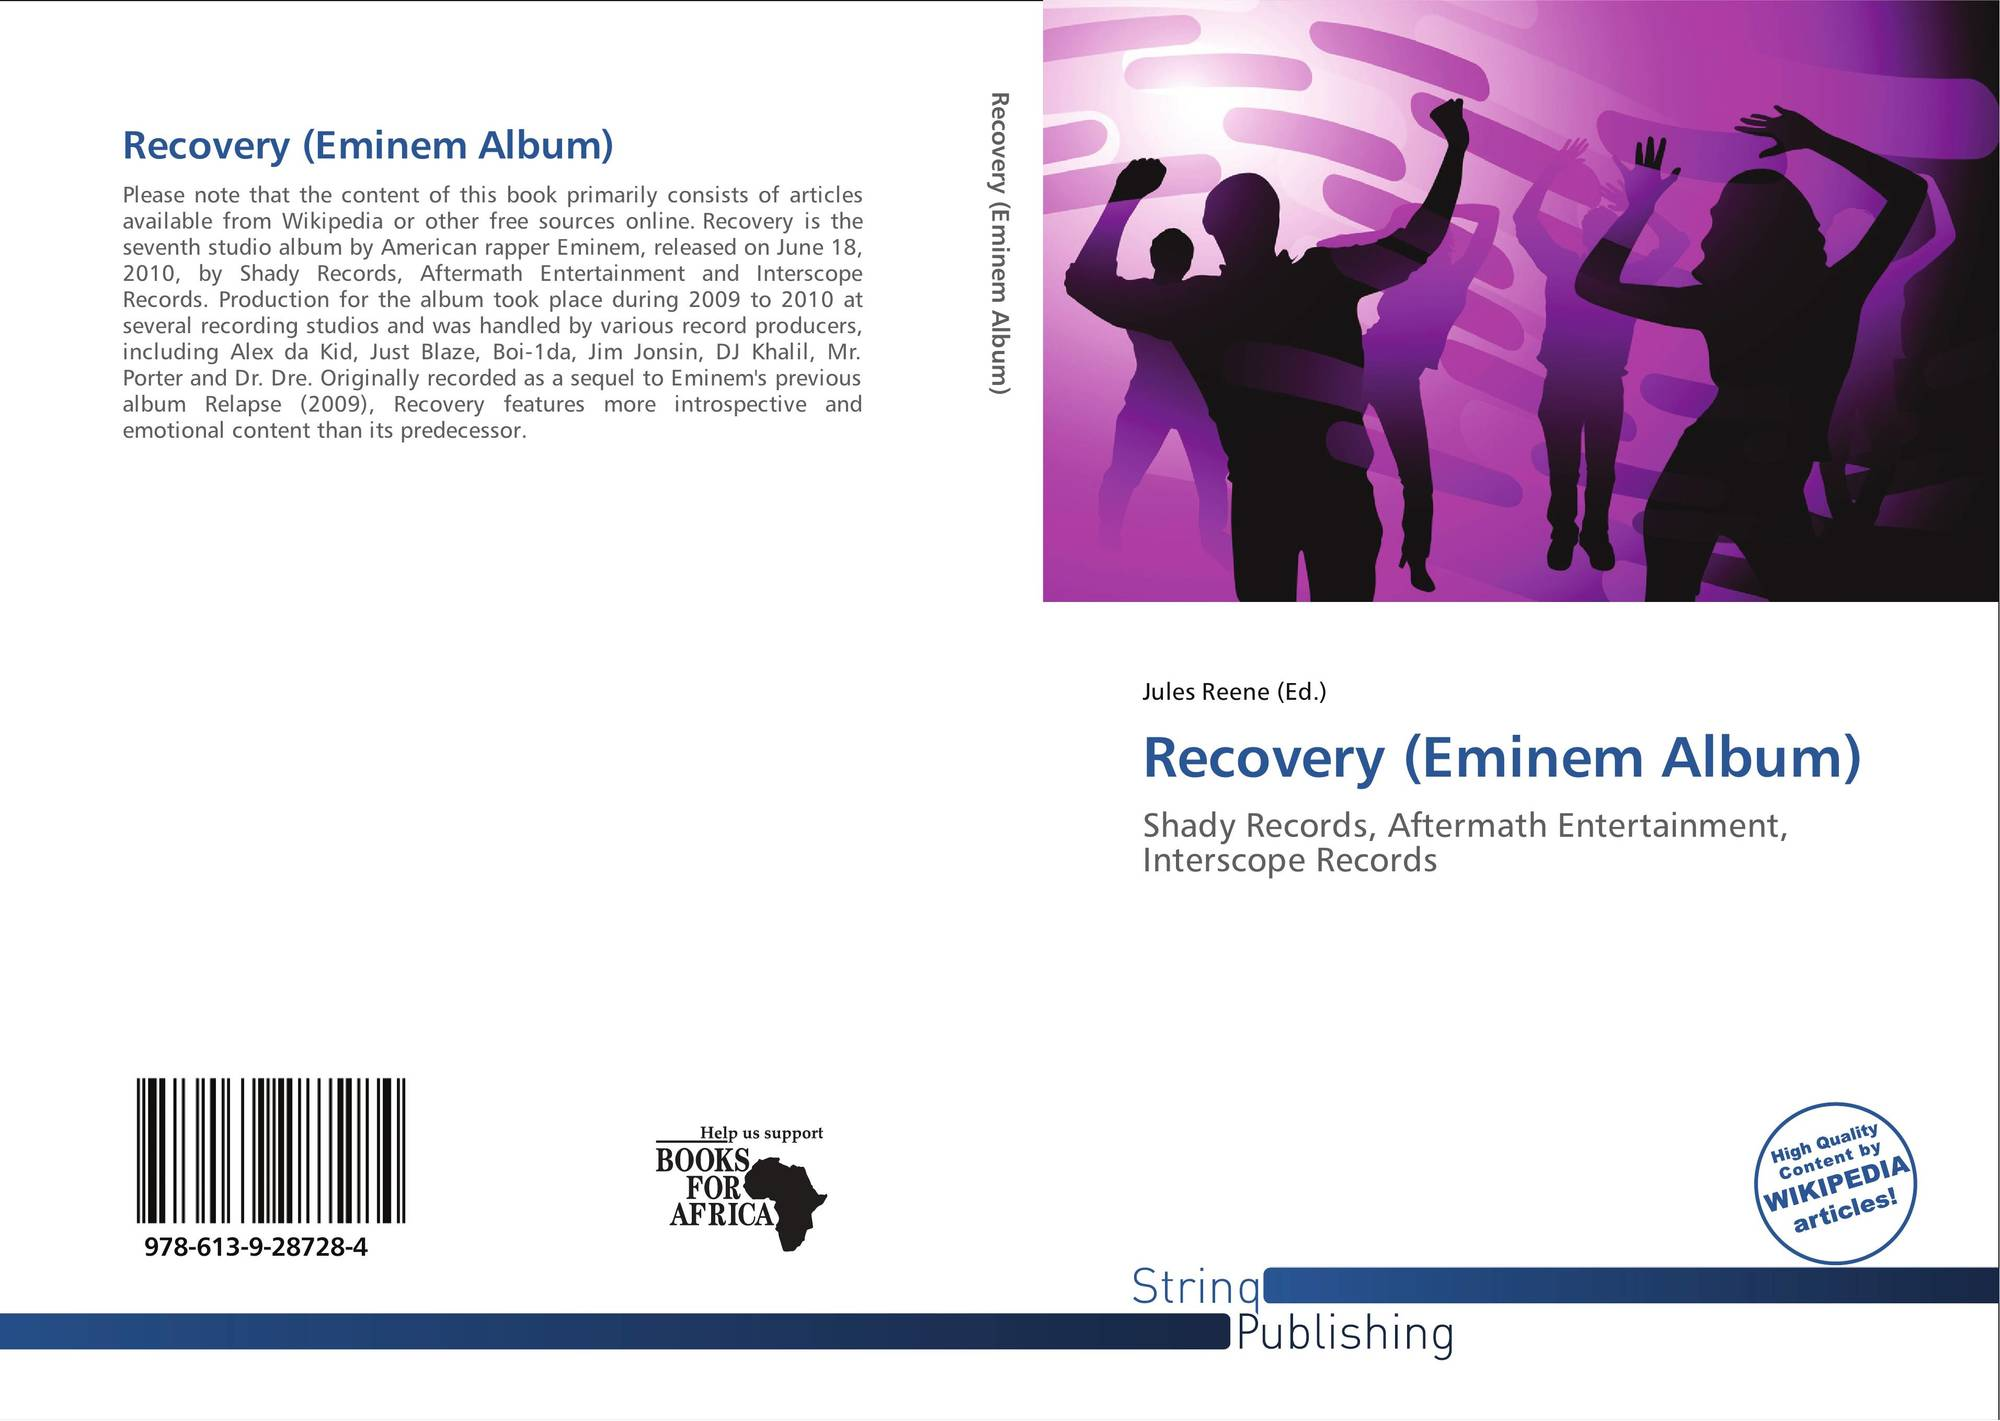 Recovery (Eminem Album), 978-613-9-28728-4, 6139287286